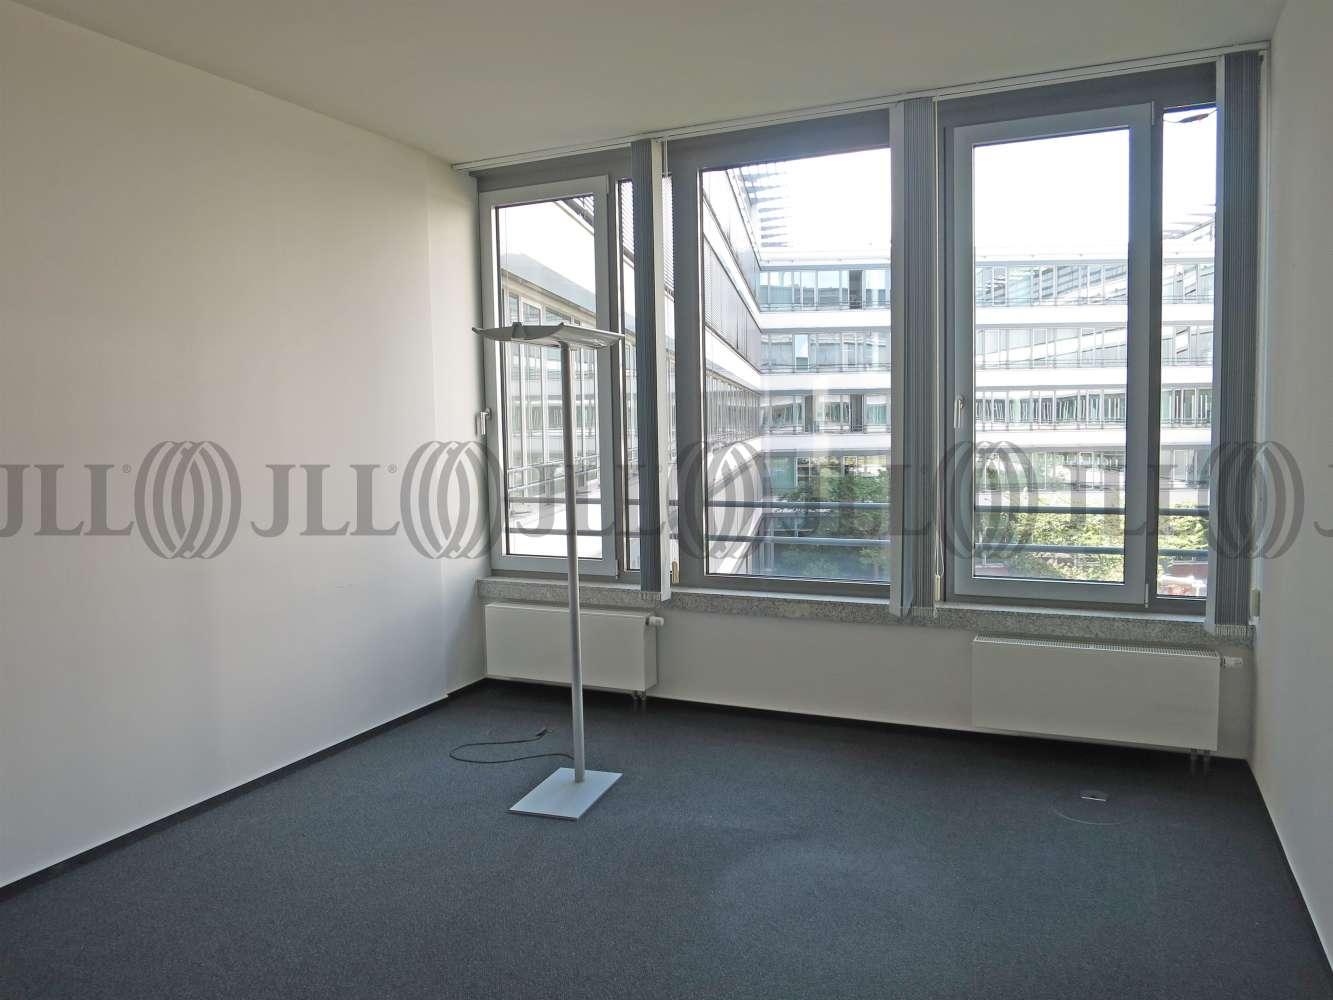 Büros Offenbach am main, 63067 - Büro - Offenbach am Main, Kaiserlei - F1436 - 10729790